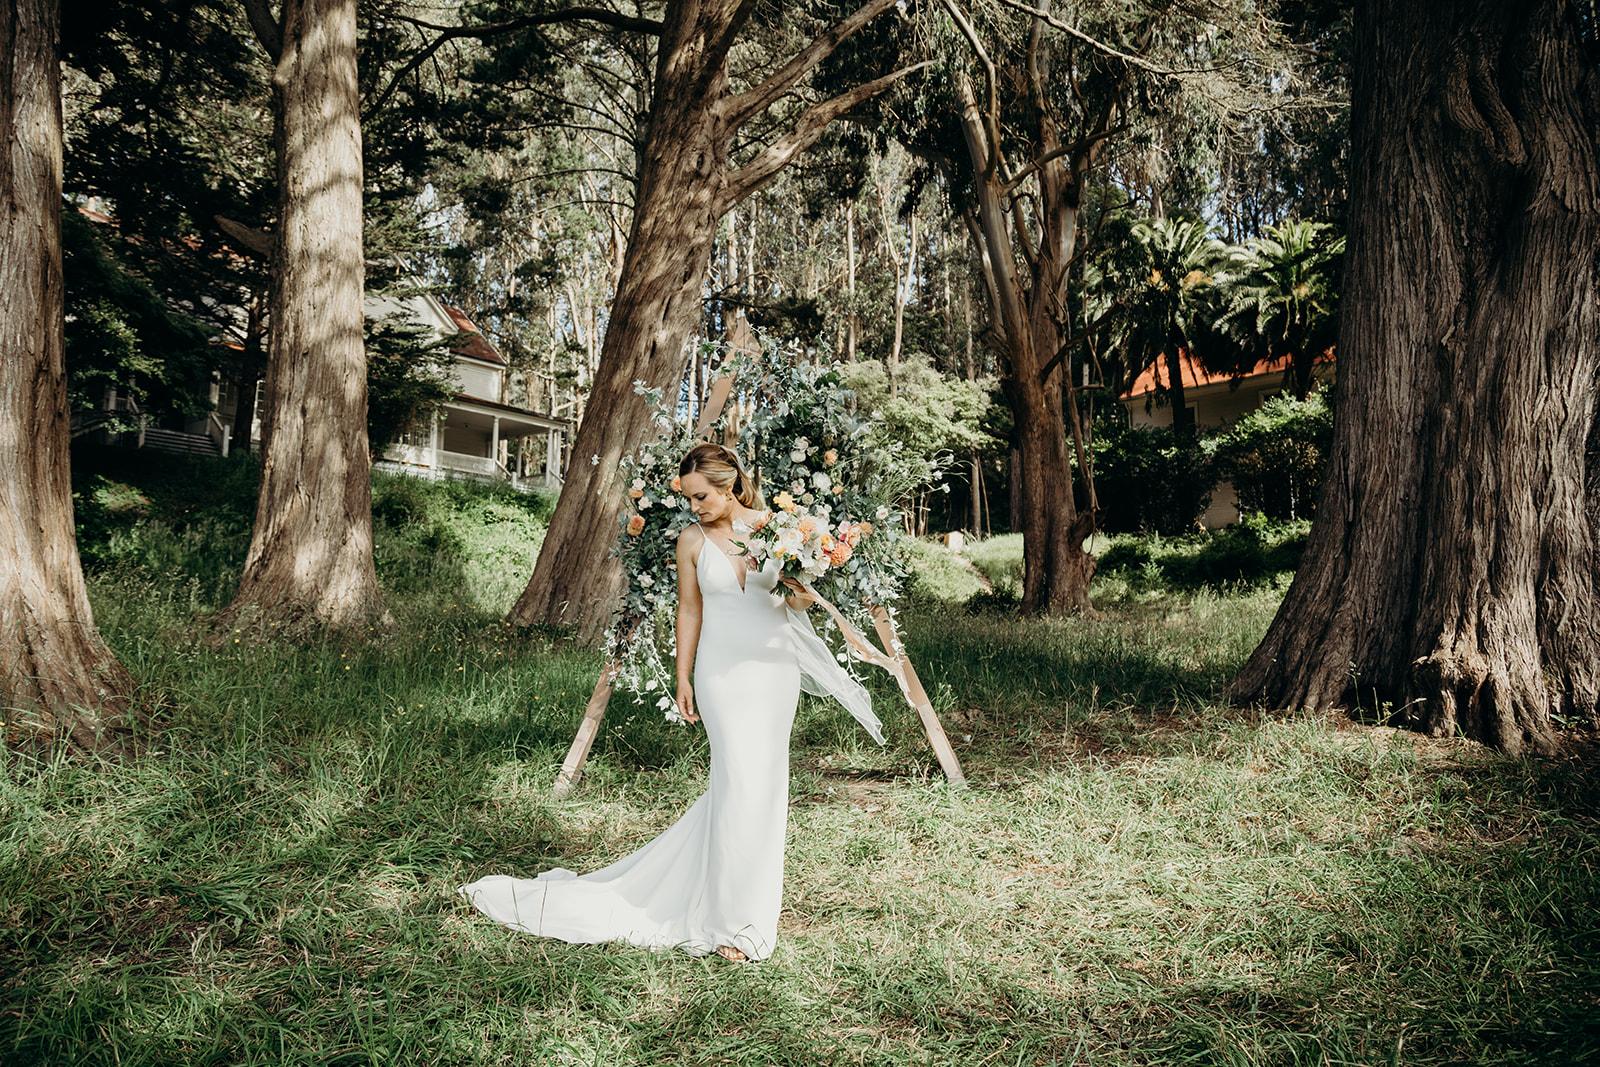 Whitney-Lauren-Headlands-Center-for-The-Arts-Wedding-1030_websize.jpg